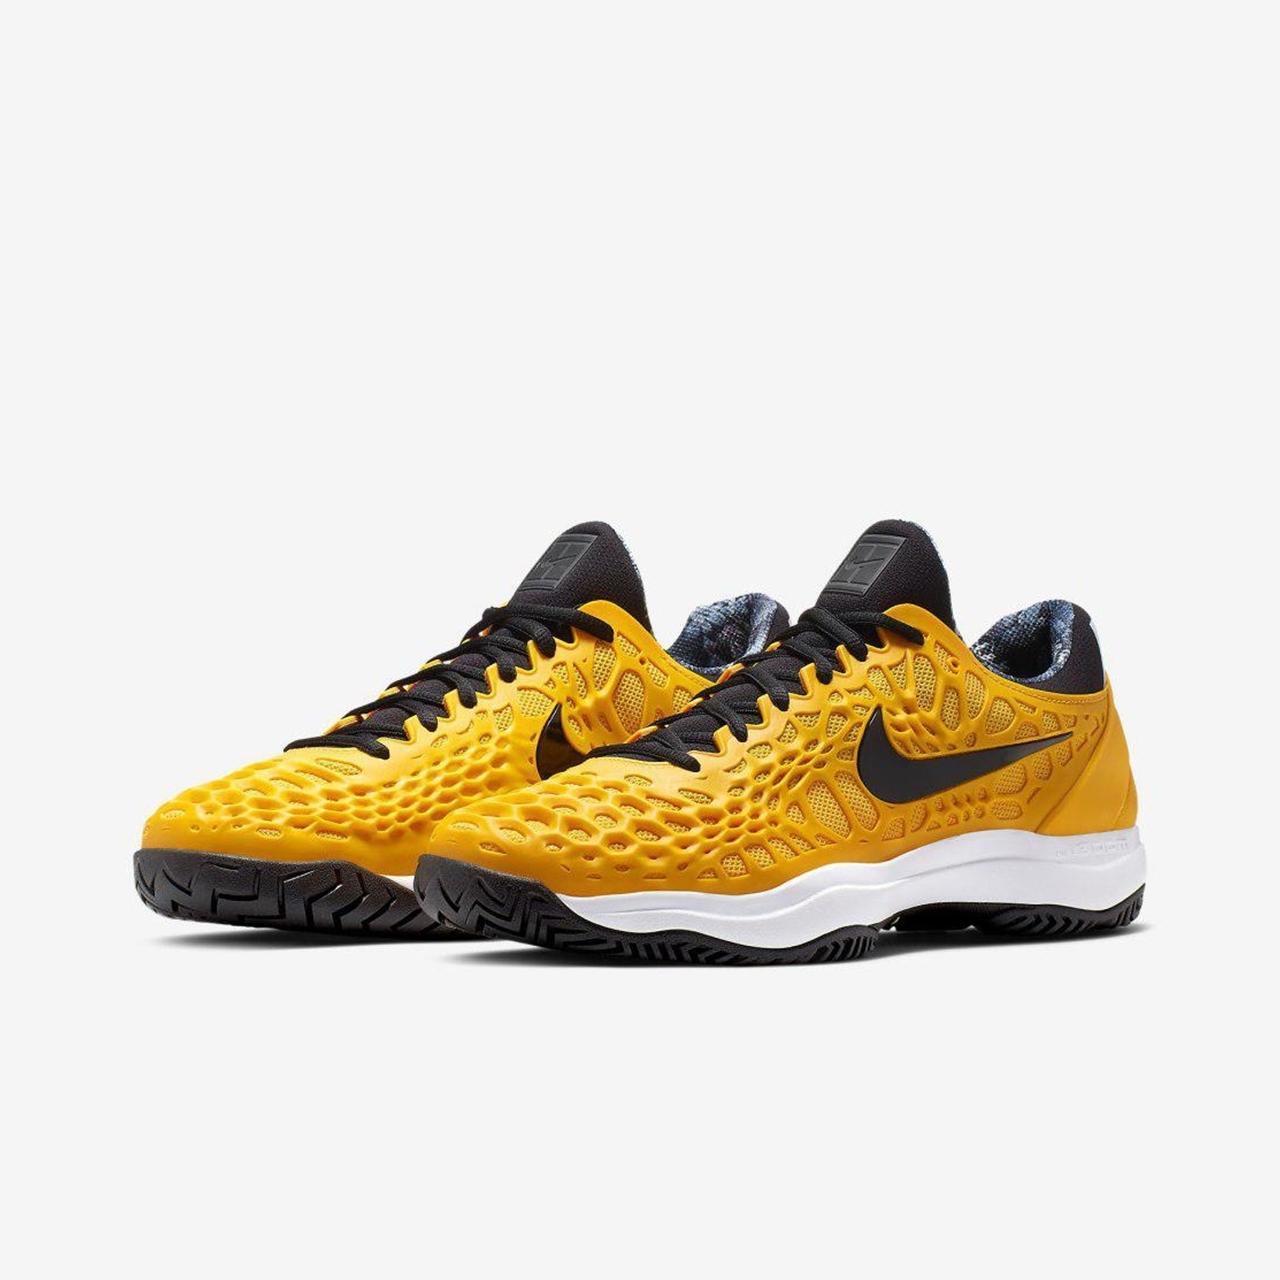 8e9079b5313 Anbefalt tilbehør. Nike Court Essentials No Show White/Black Kun nå : Pris:  kr 149 Ordinær ...